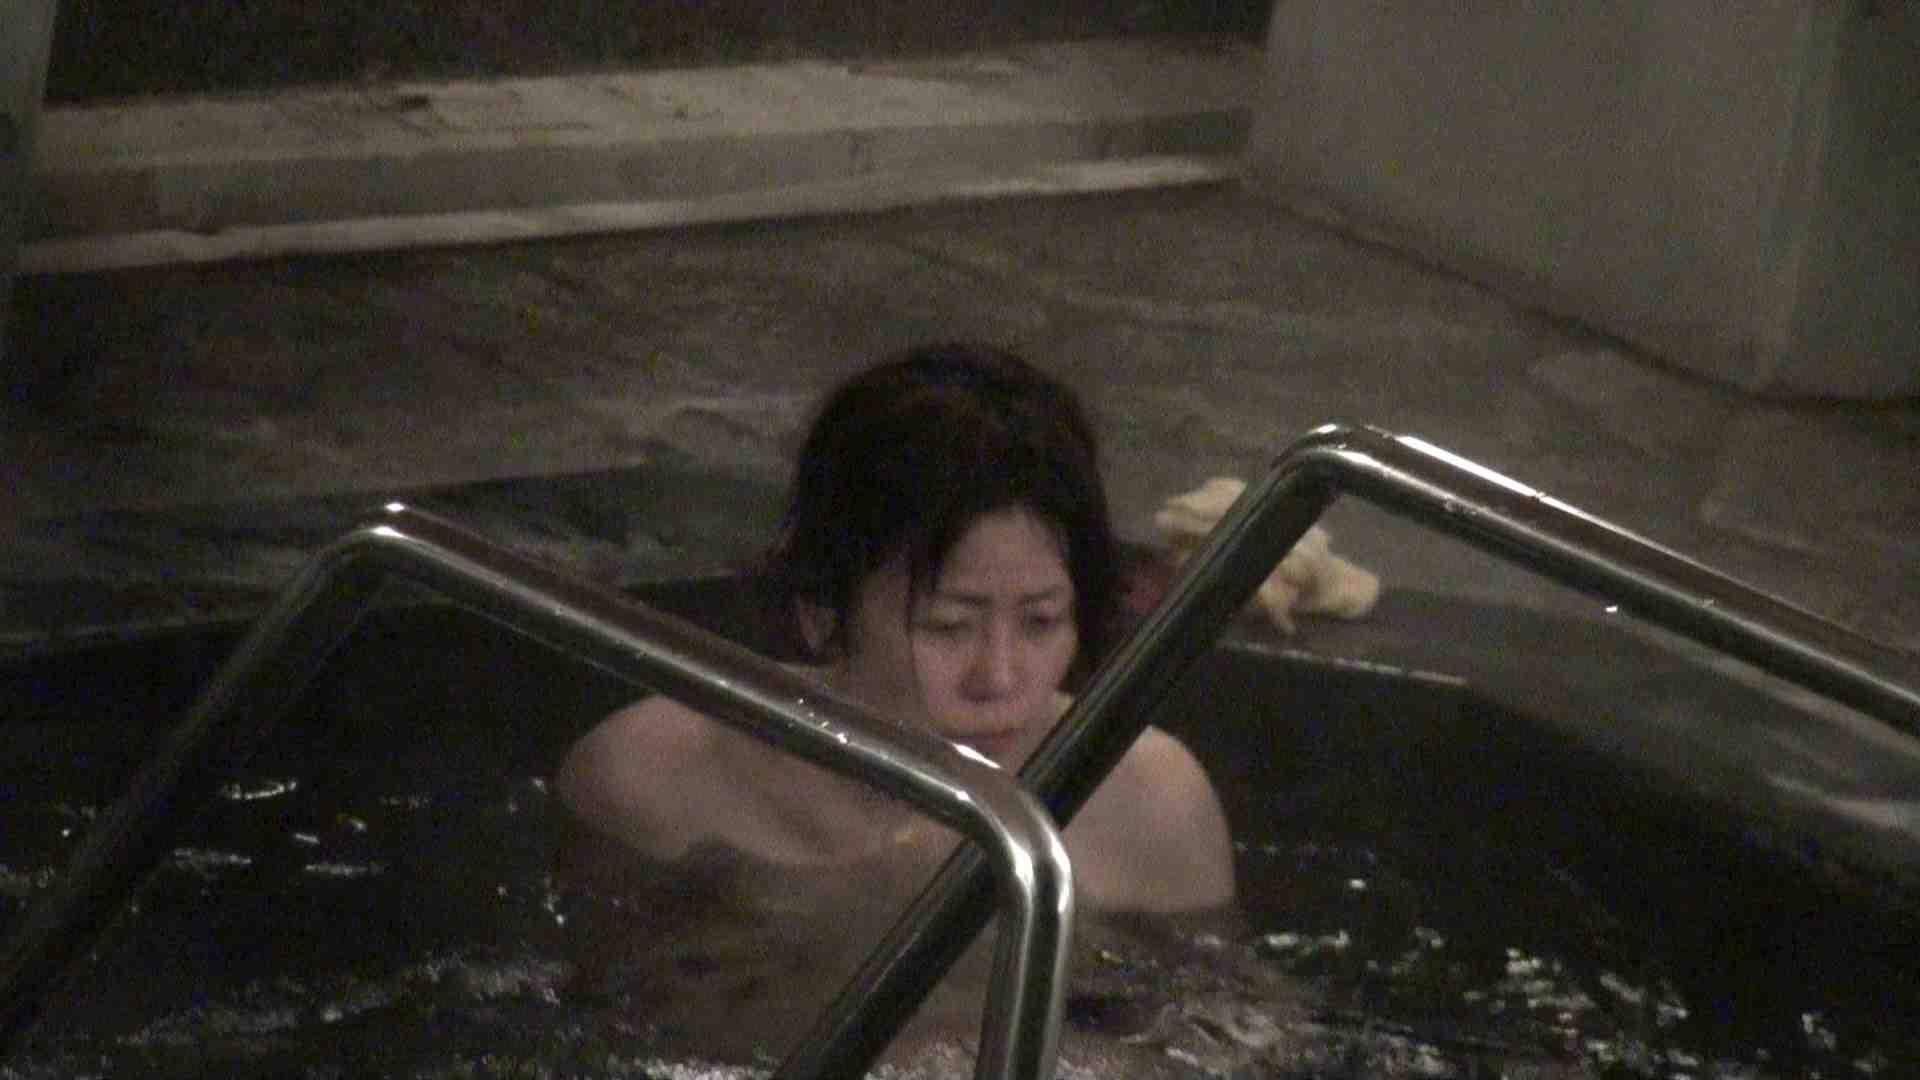 Aquaな露天風呂Vol.433 OLのエロ生活 | 露天風呂  67連発 61